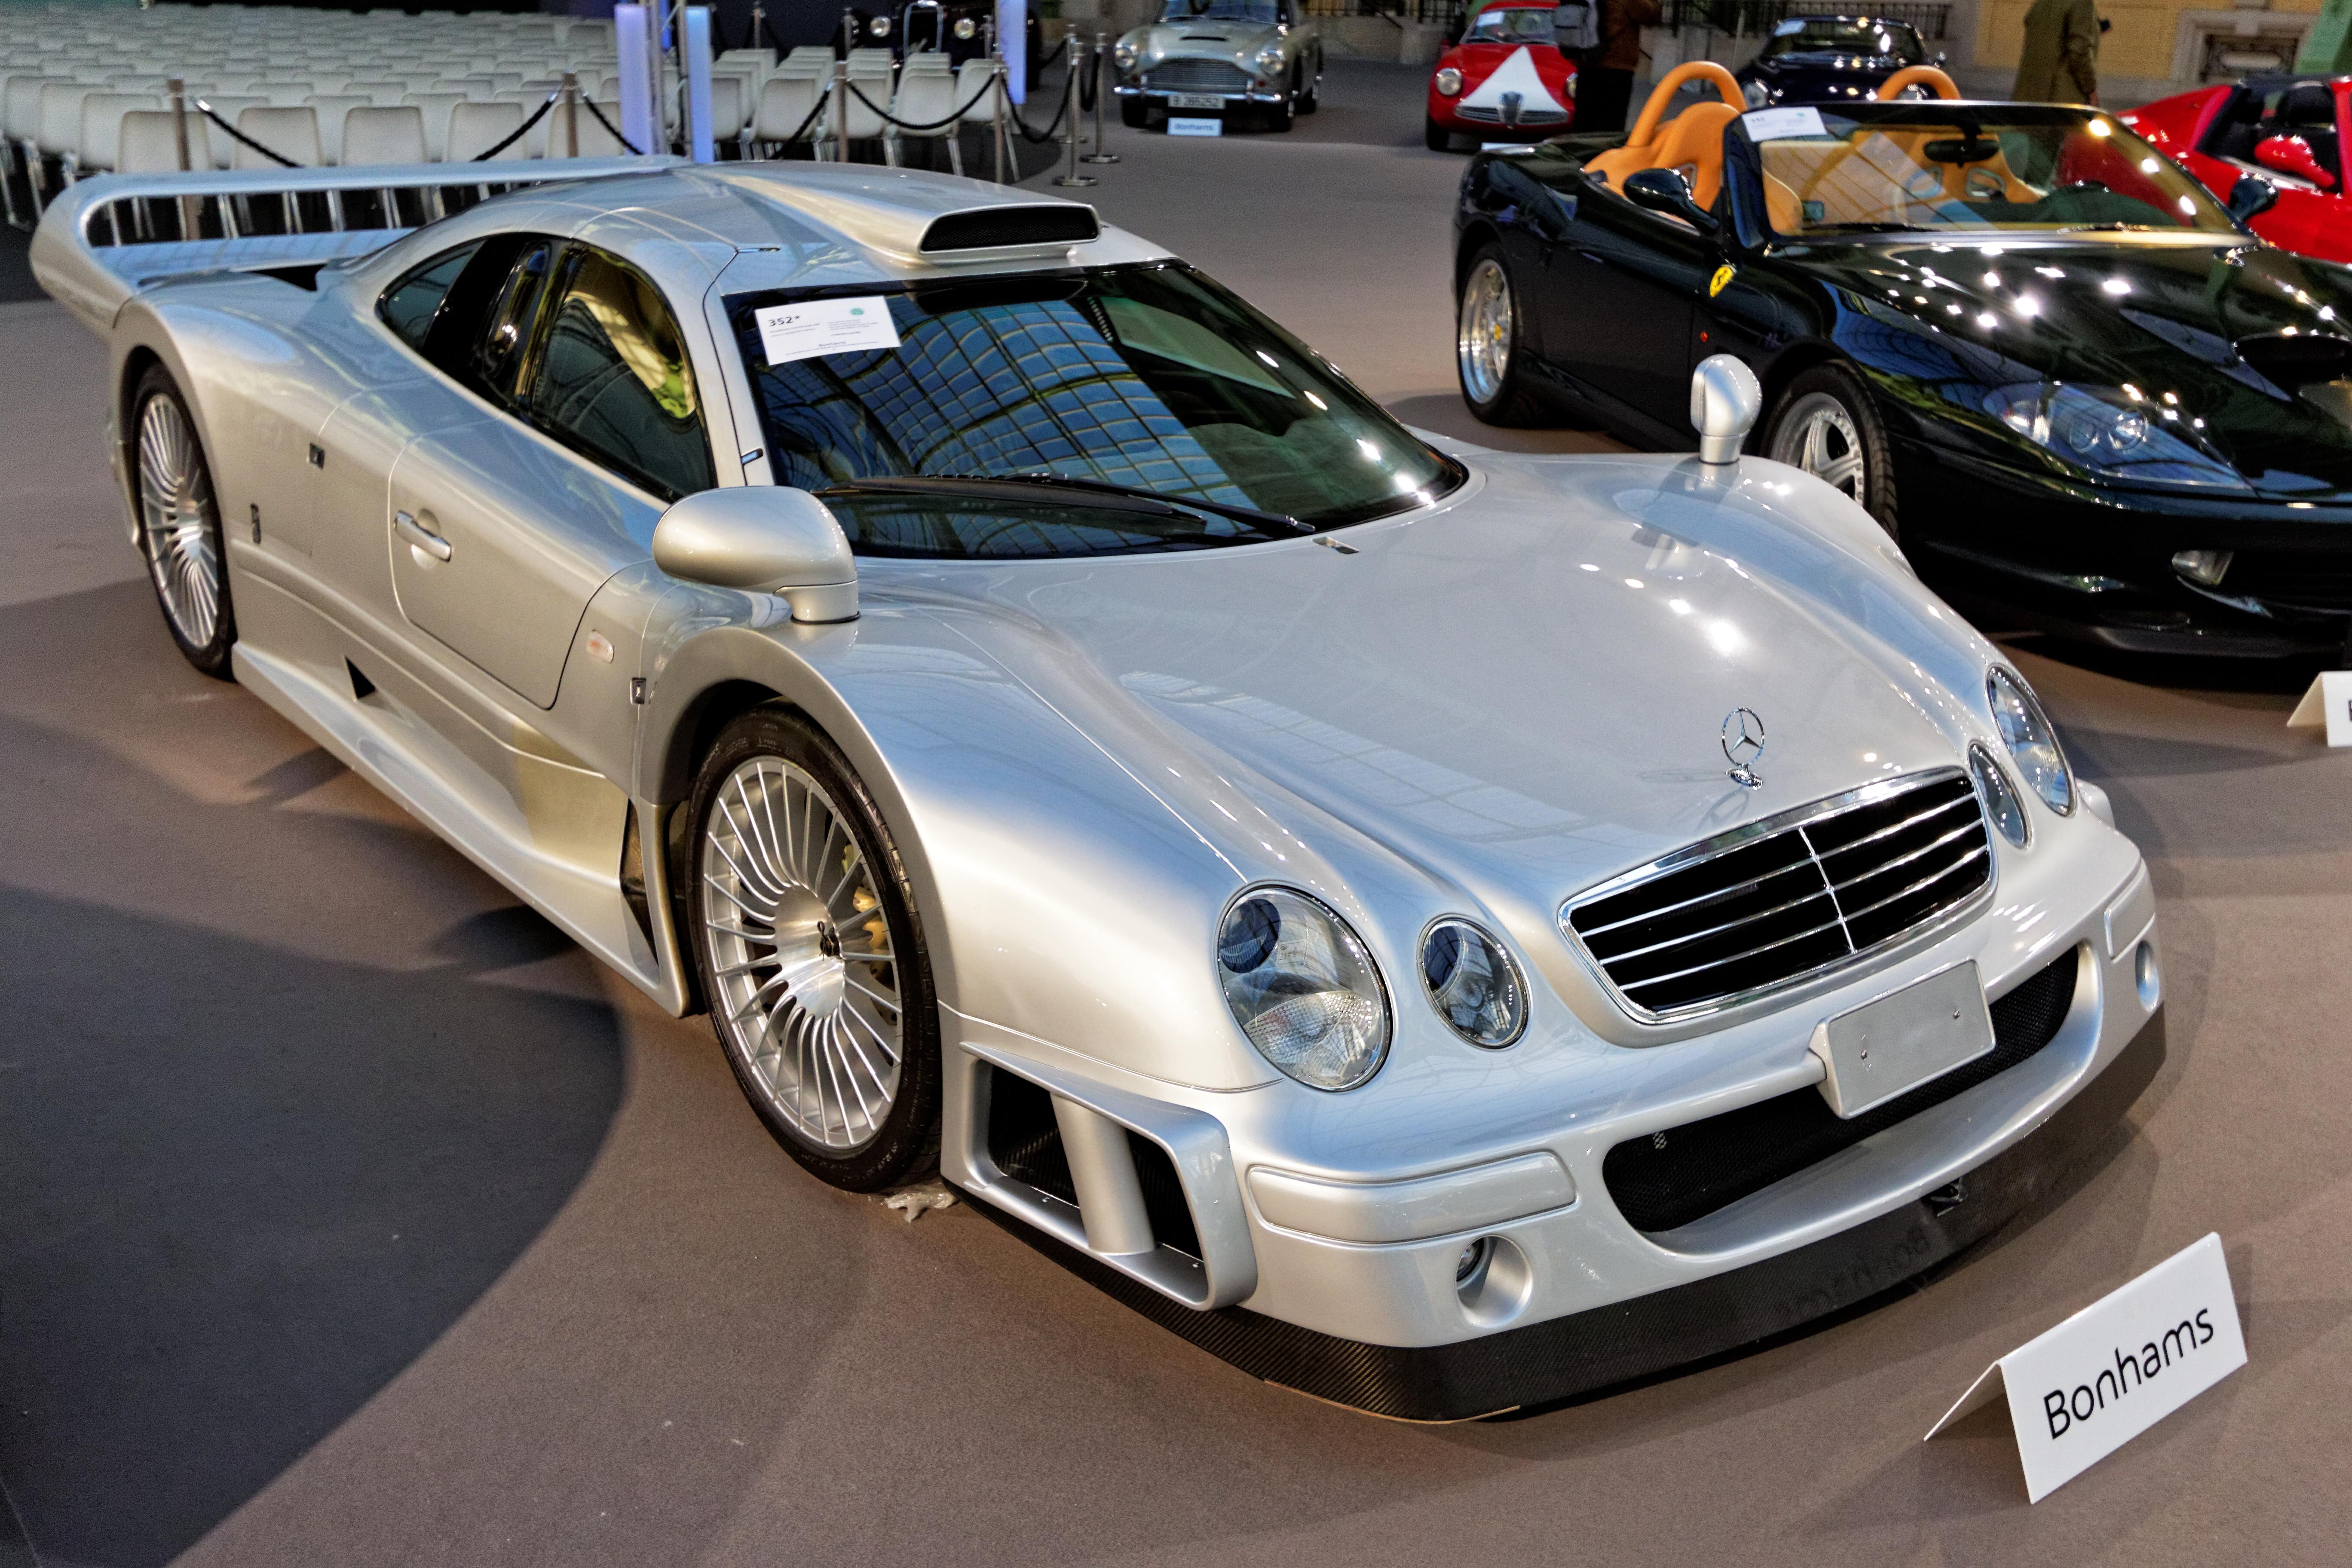 File Paris Bonhams 2016 Mercedes Benz Clk Gtr Coupé 2000 002 Jpg